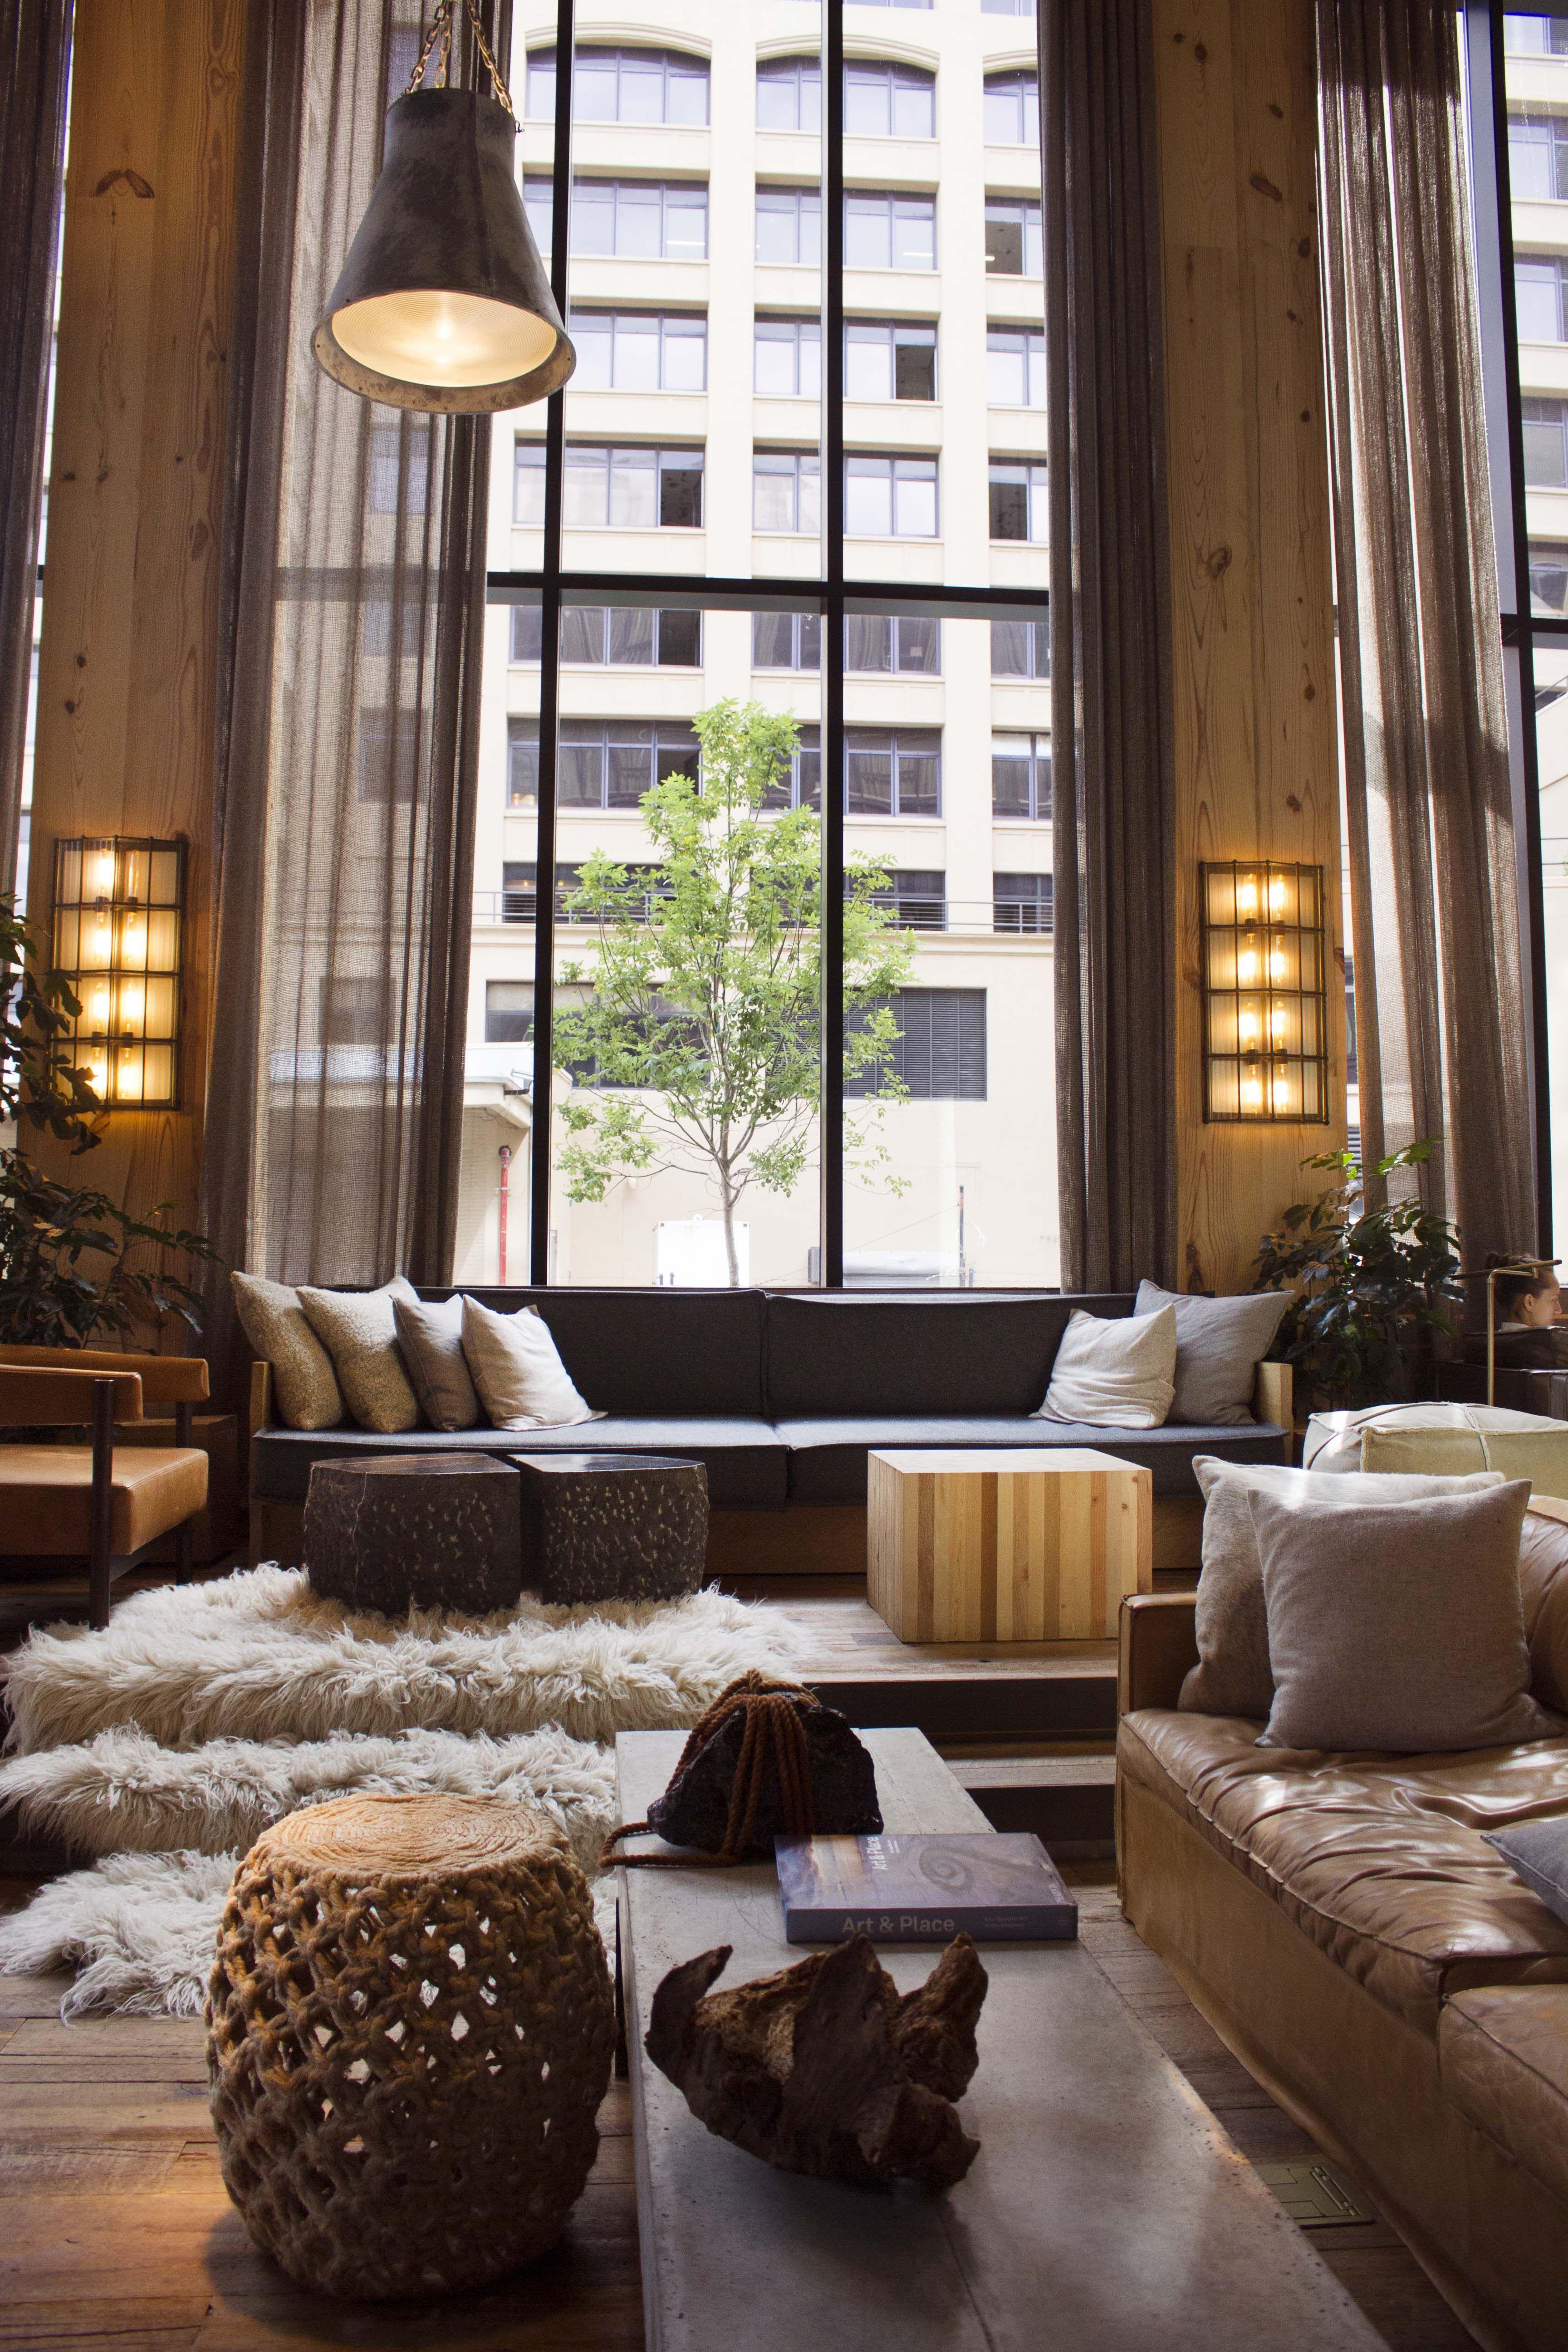 Hotel 1 Brooklyn Nyc Amazing Interiors In 2019 Room